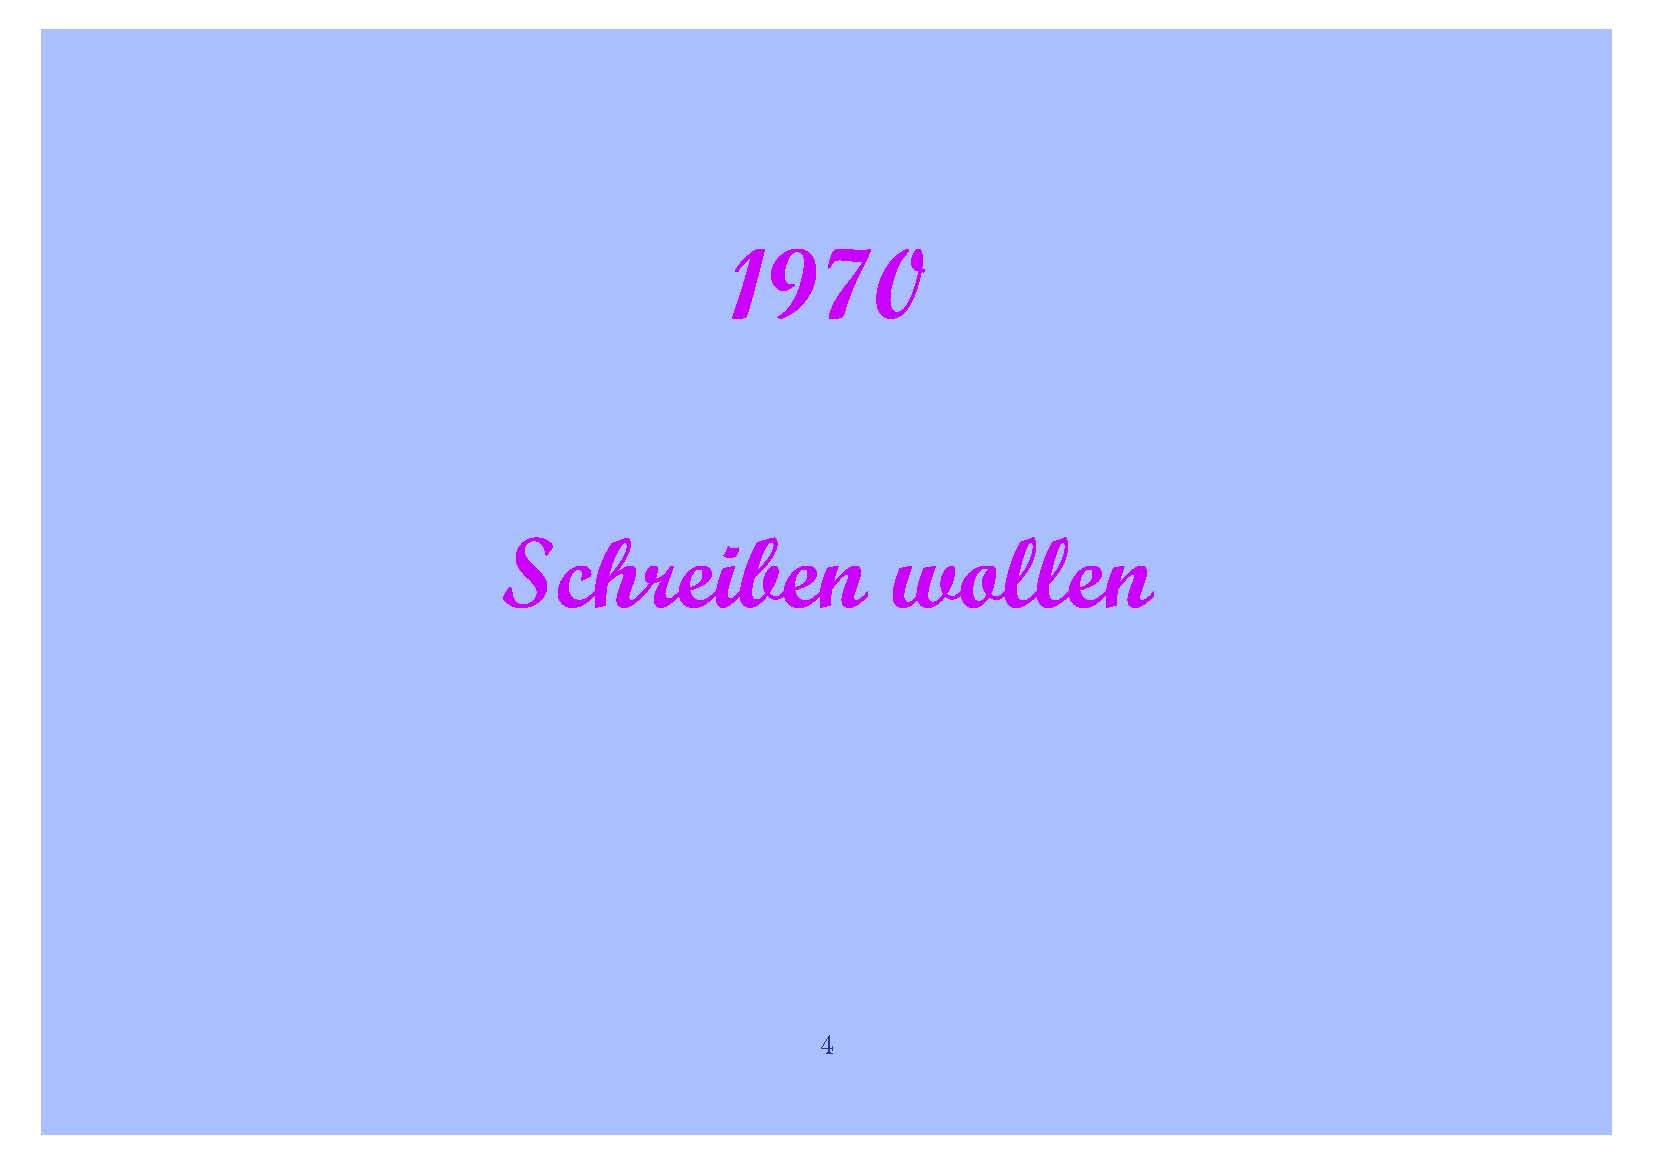 ™Gigabuch-Bibliothek/iAutobiographie Band 1/Kapitel 1